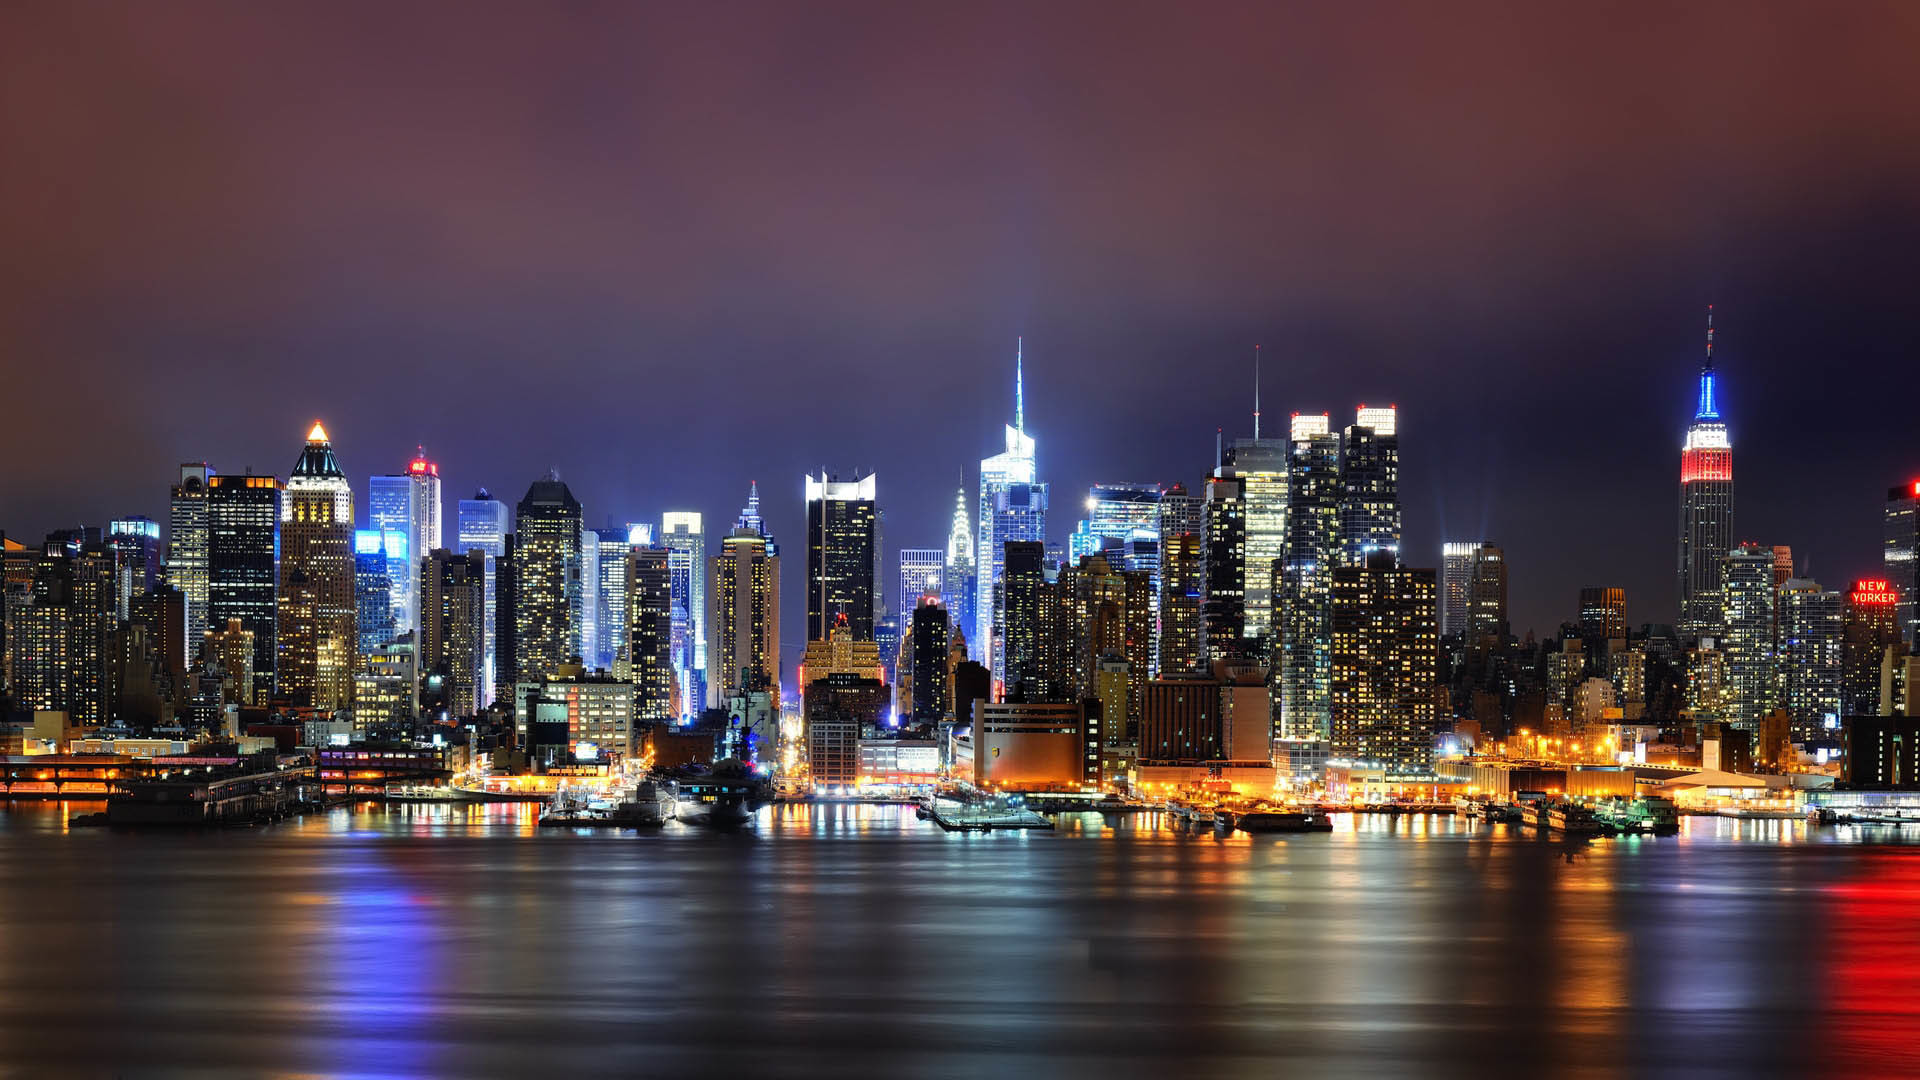 New York City Night Wallpapers Hd   Data-src - New York City Night Skyline - HD Wallpaper